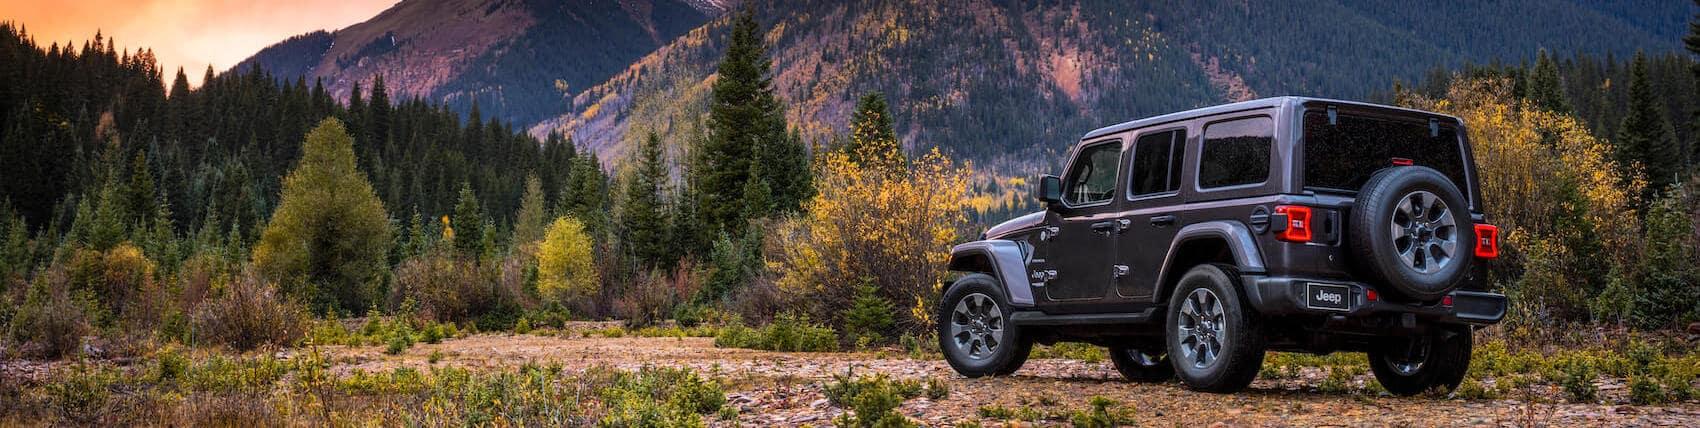 Jeep Wrangler Engine Performance